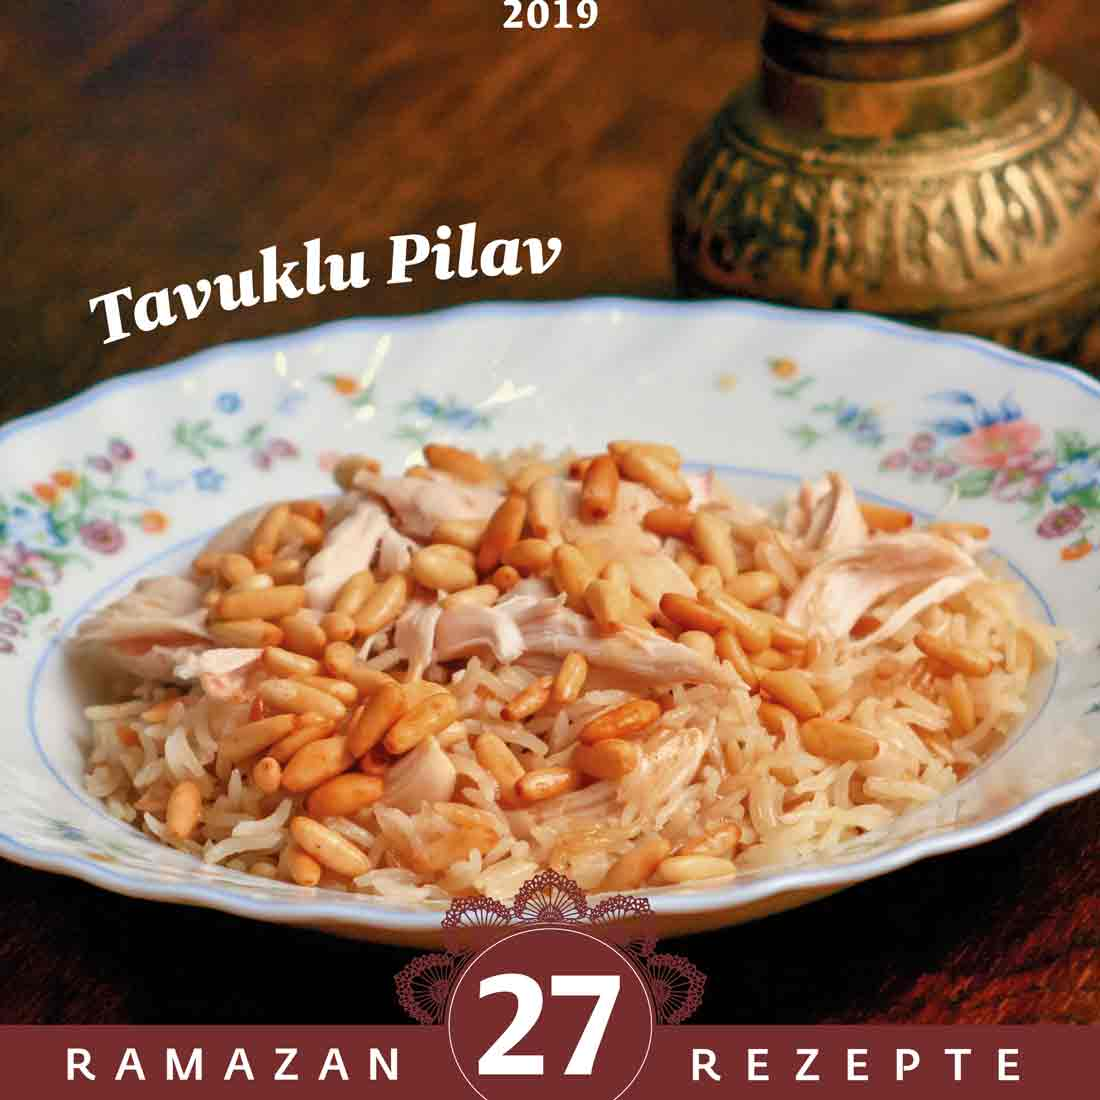 Ramadan 2019 jpeg 27